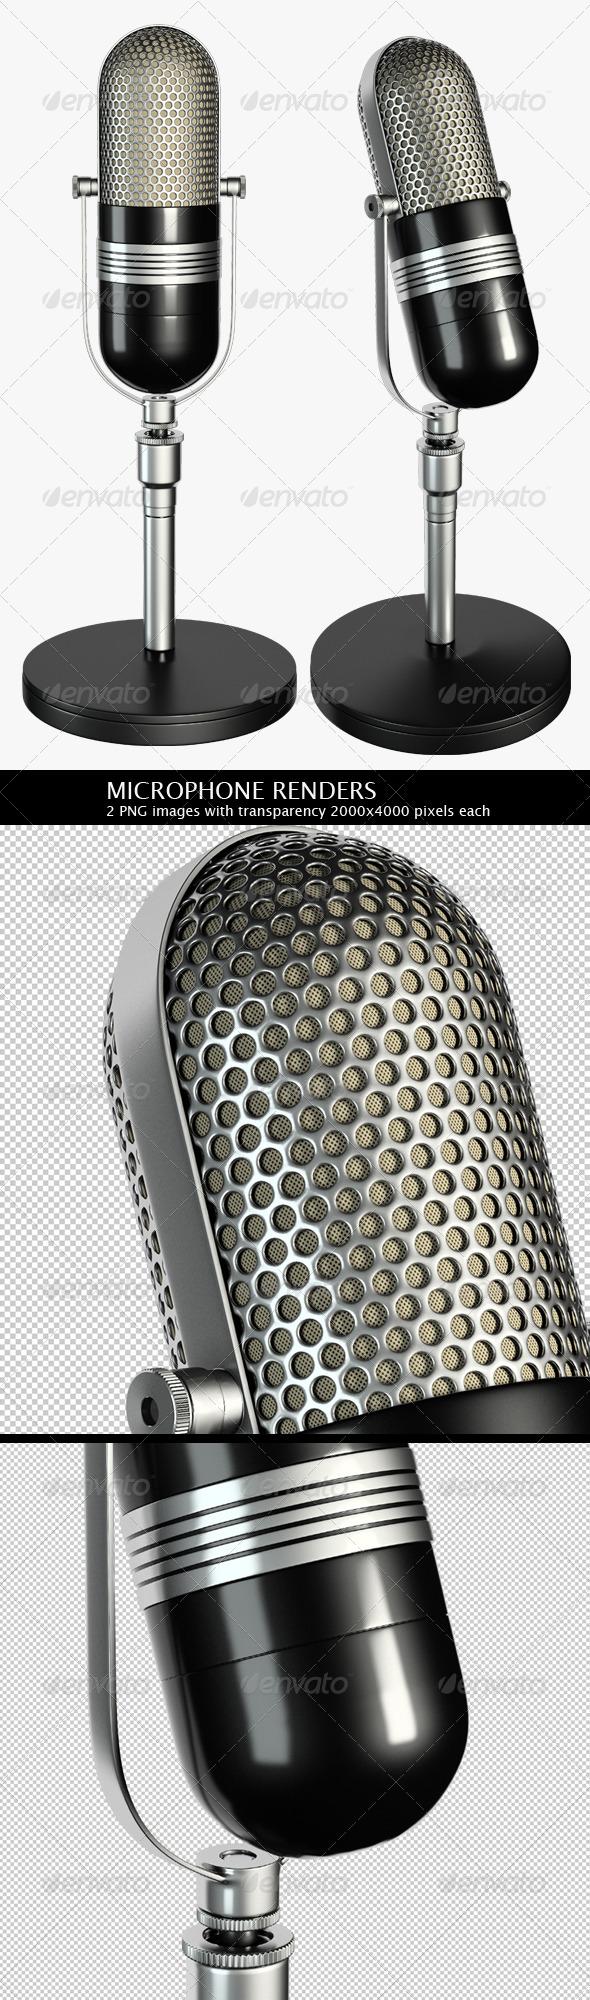 2 Microphone Renders - Objects 3D Renders